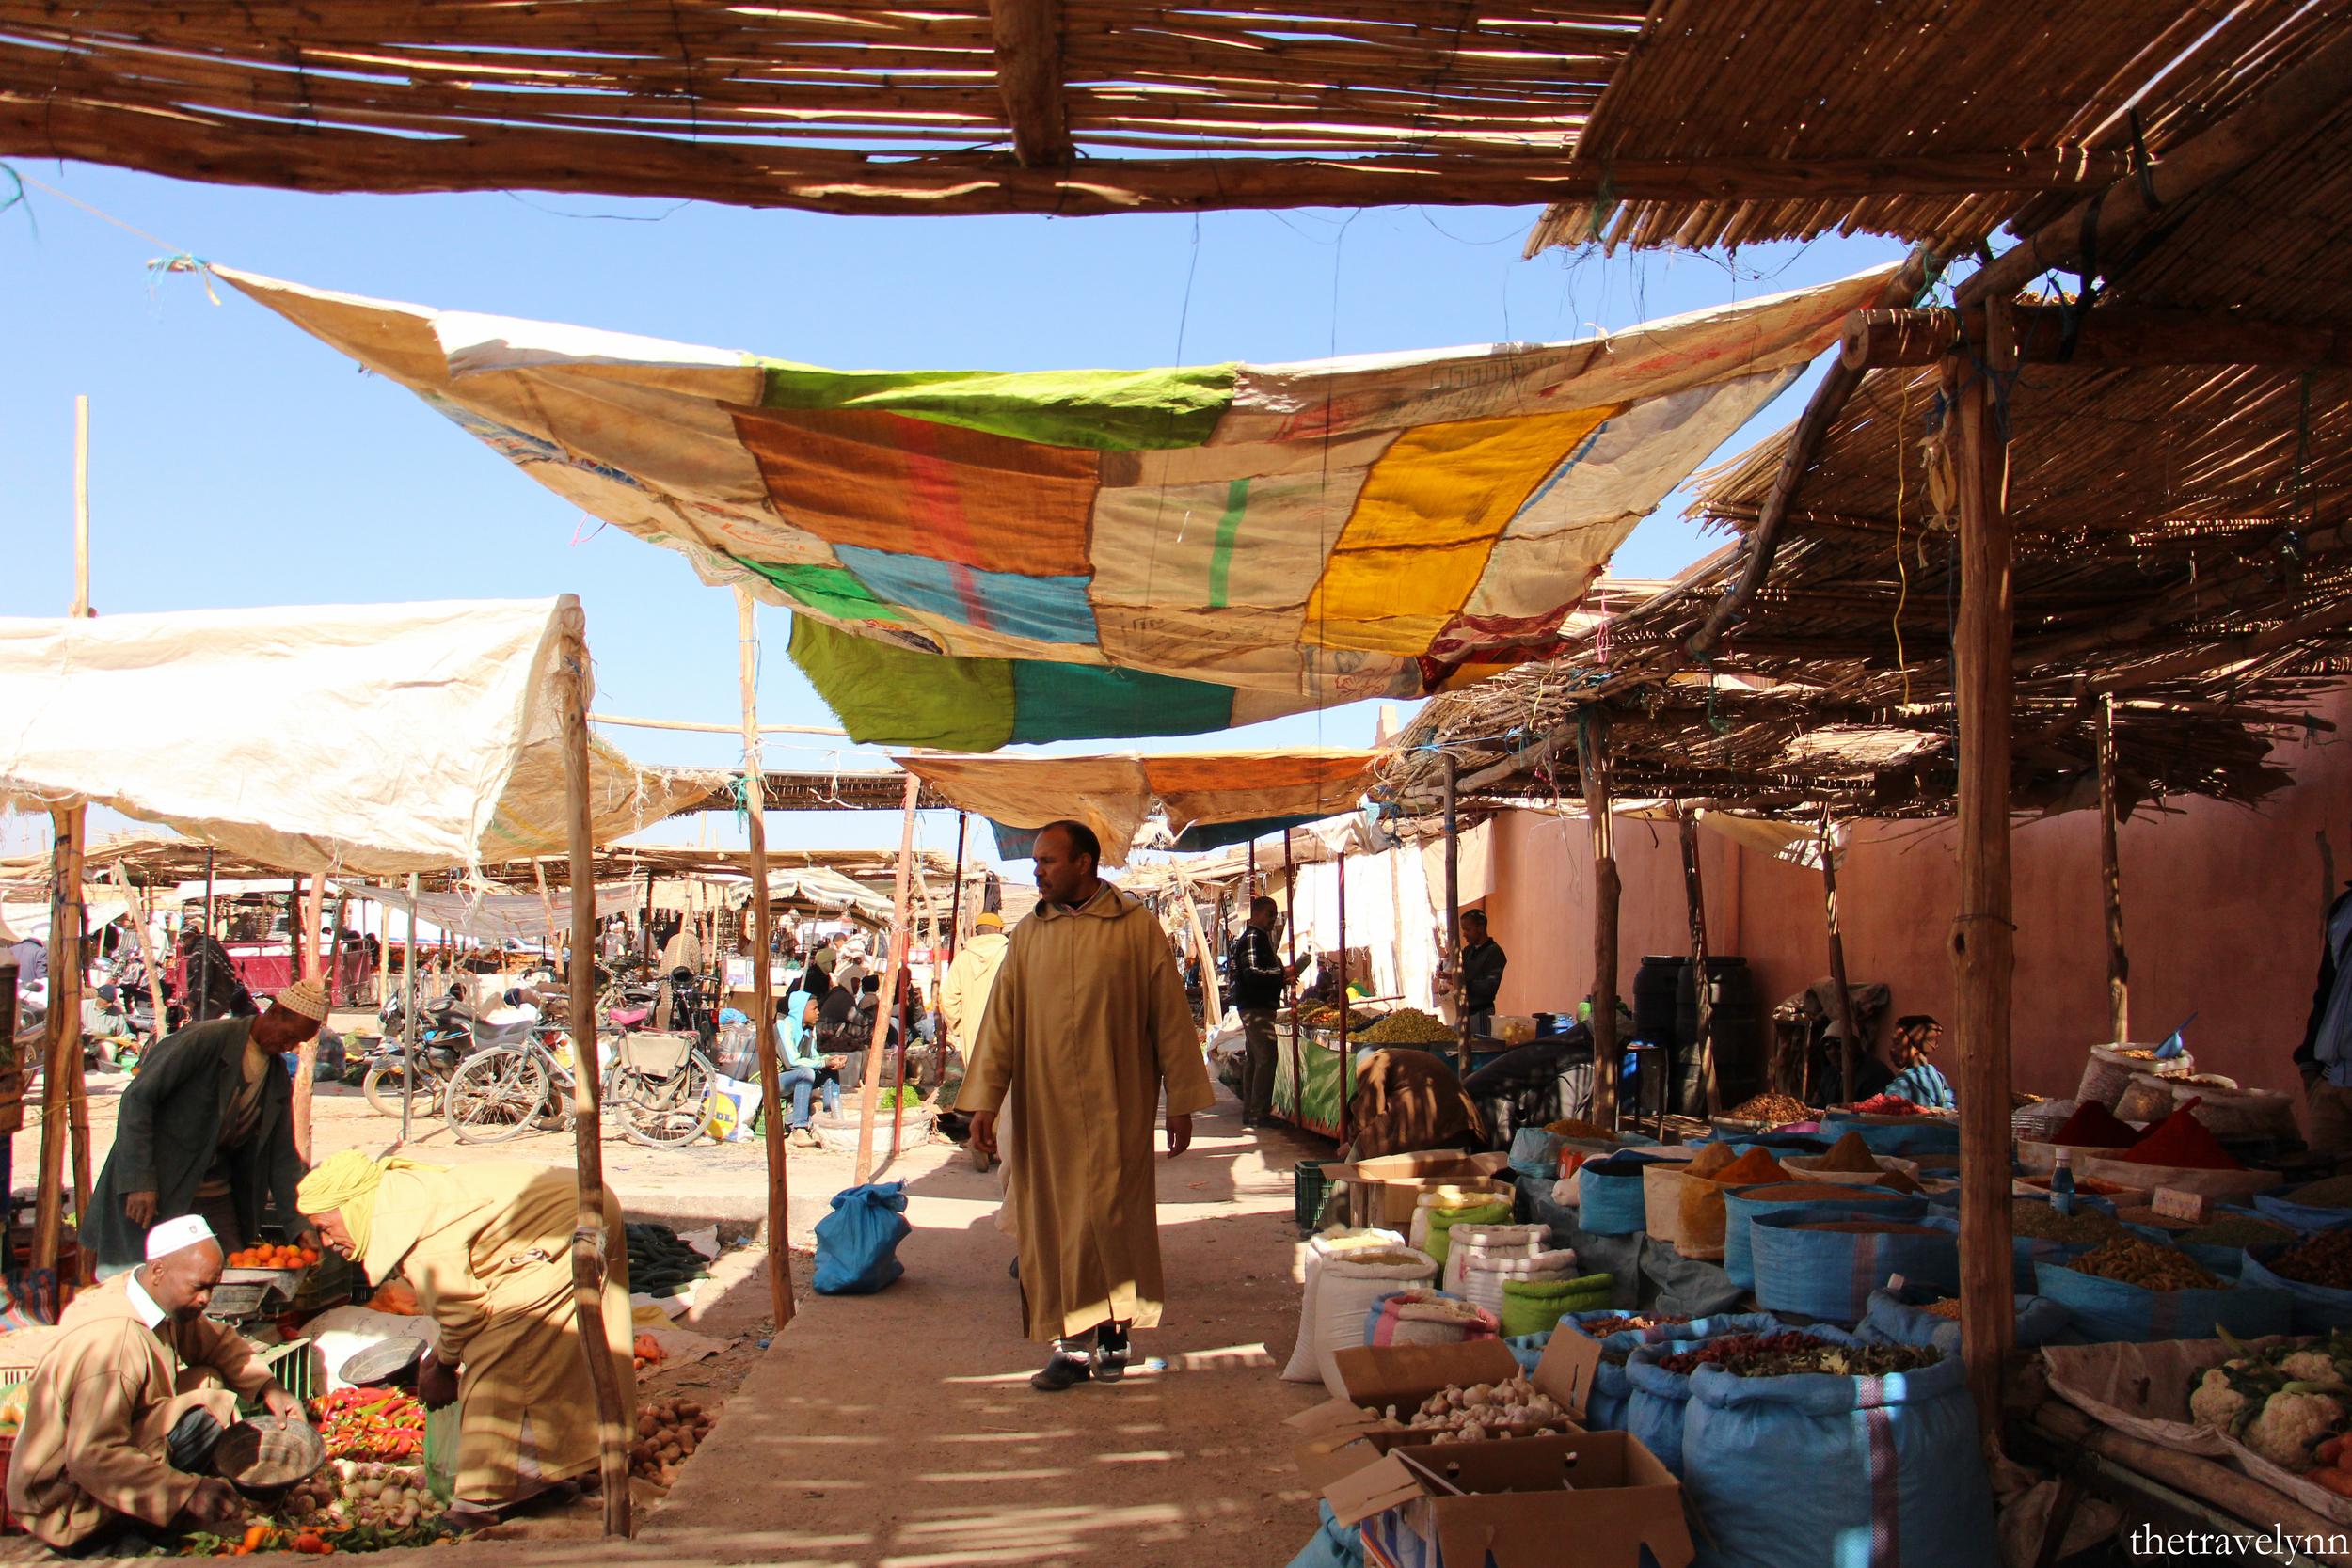 Berber Market patron